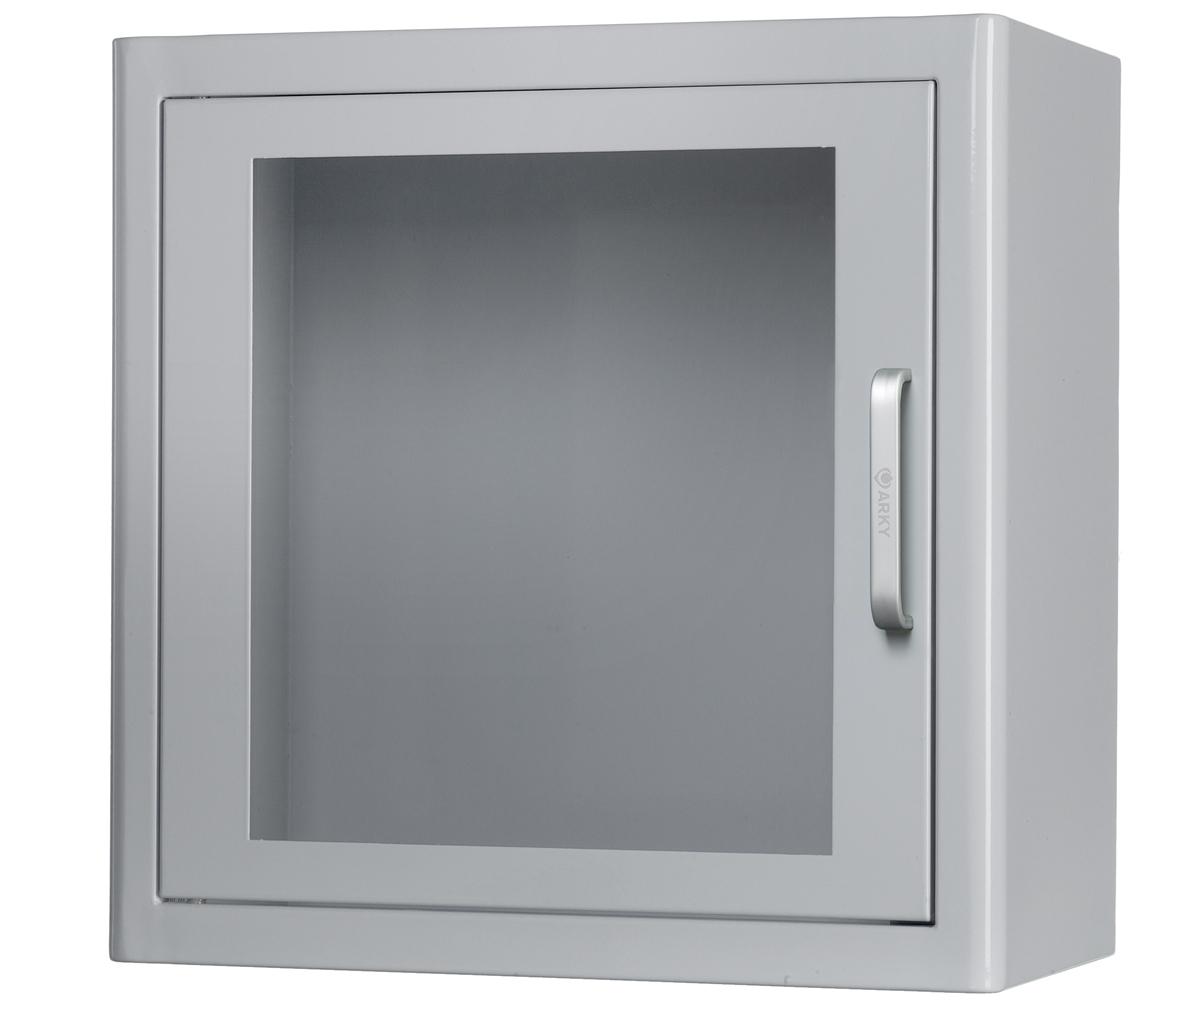 Beau Indoor Alarmed Defibrillator Cabinet ( Arky Case 251 )